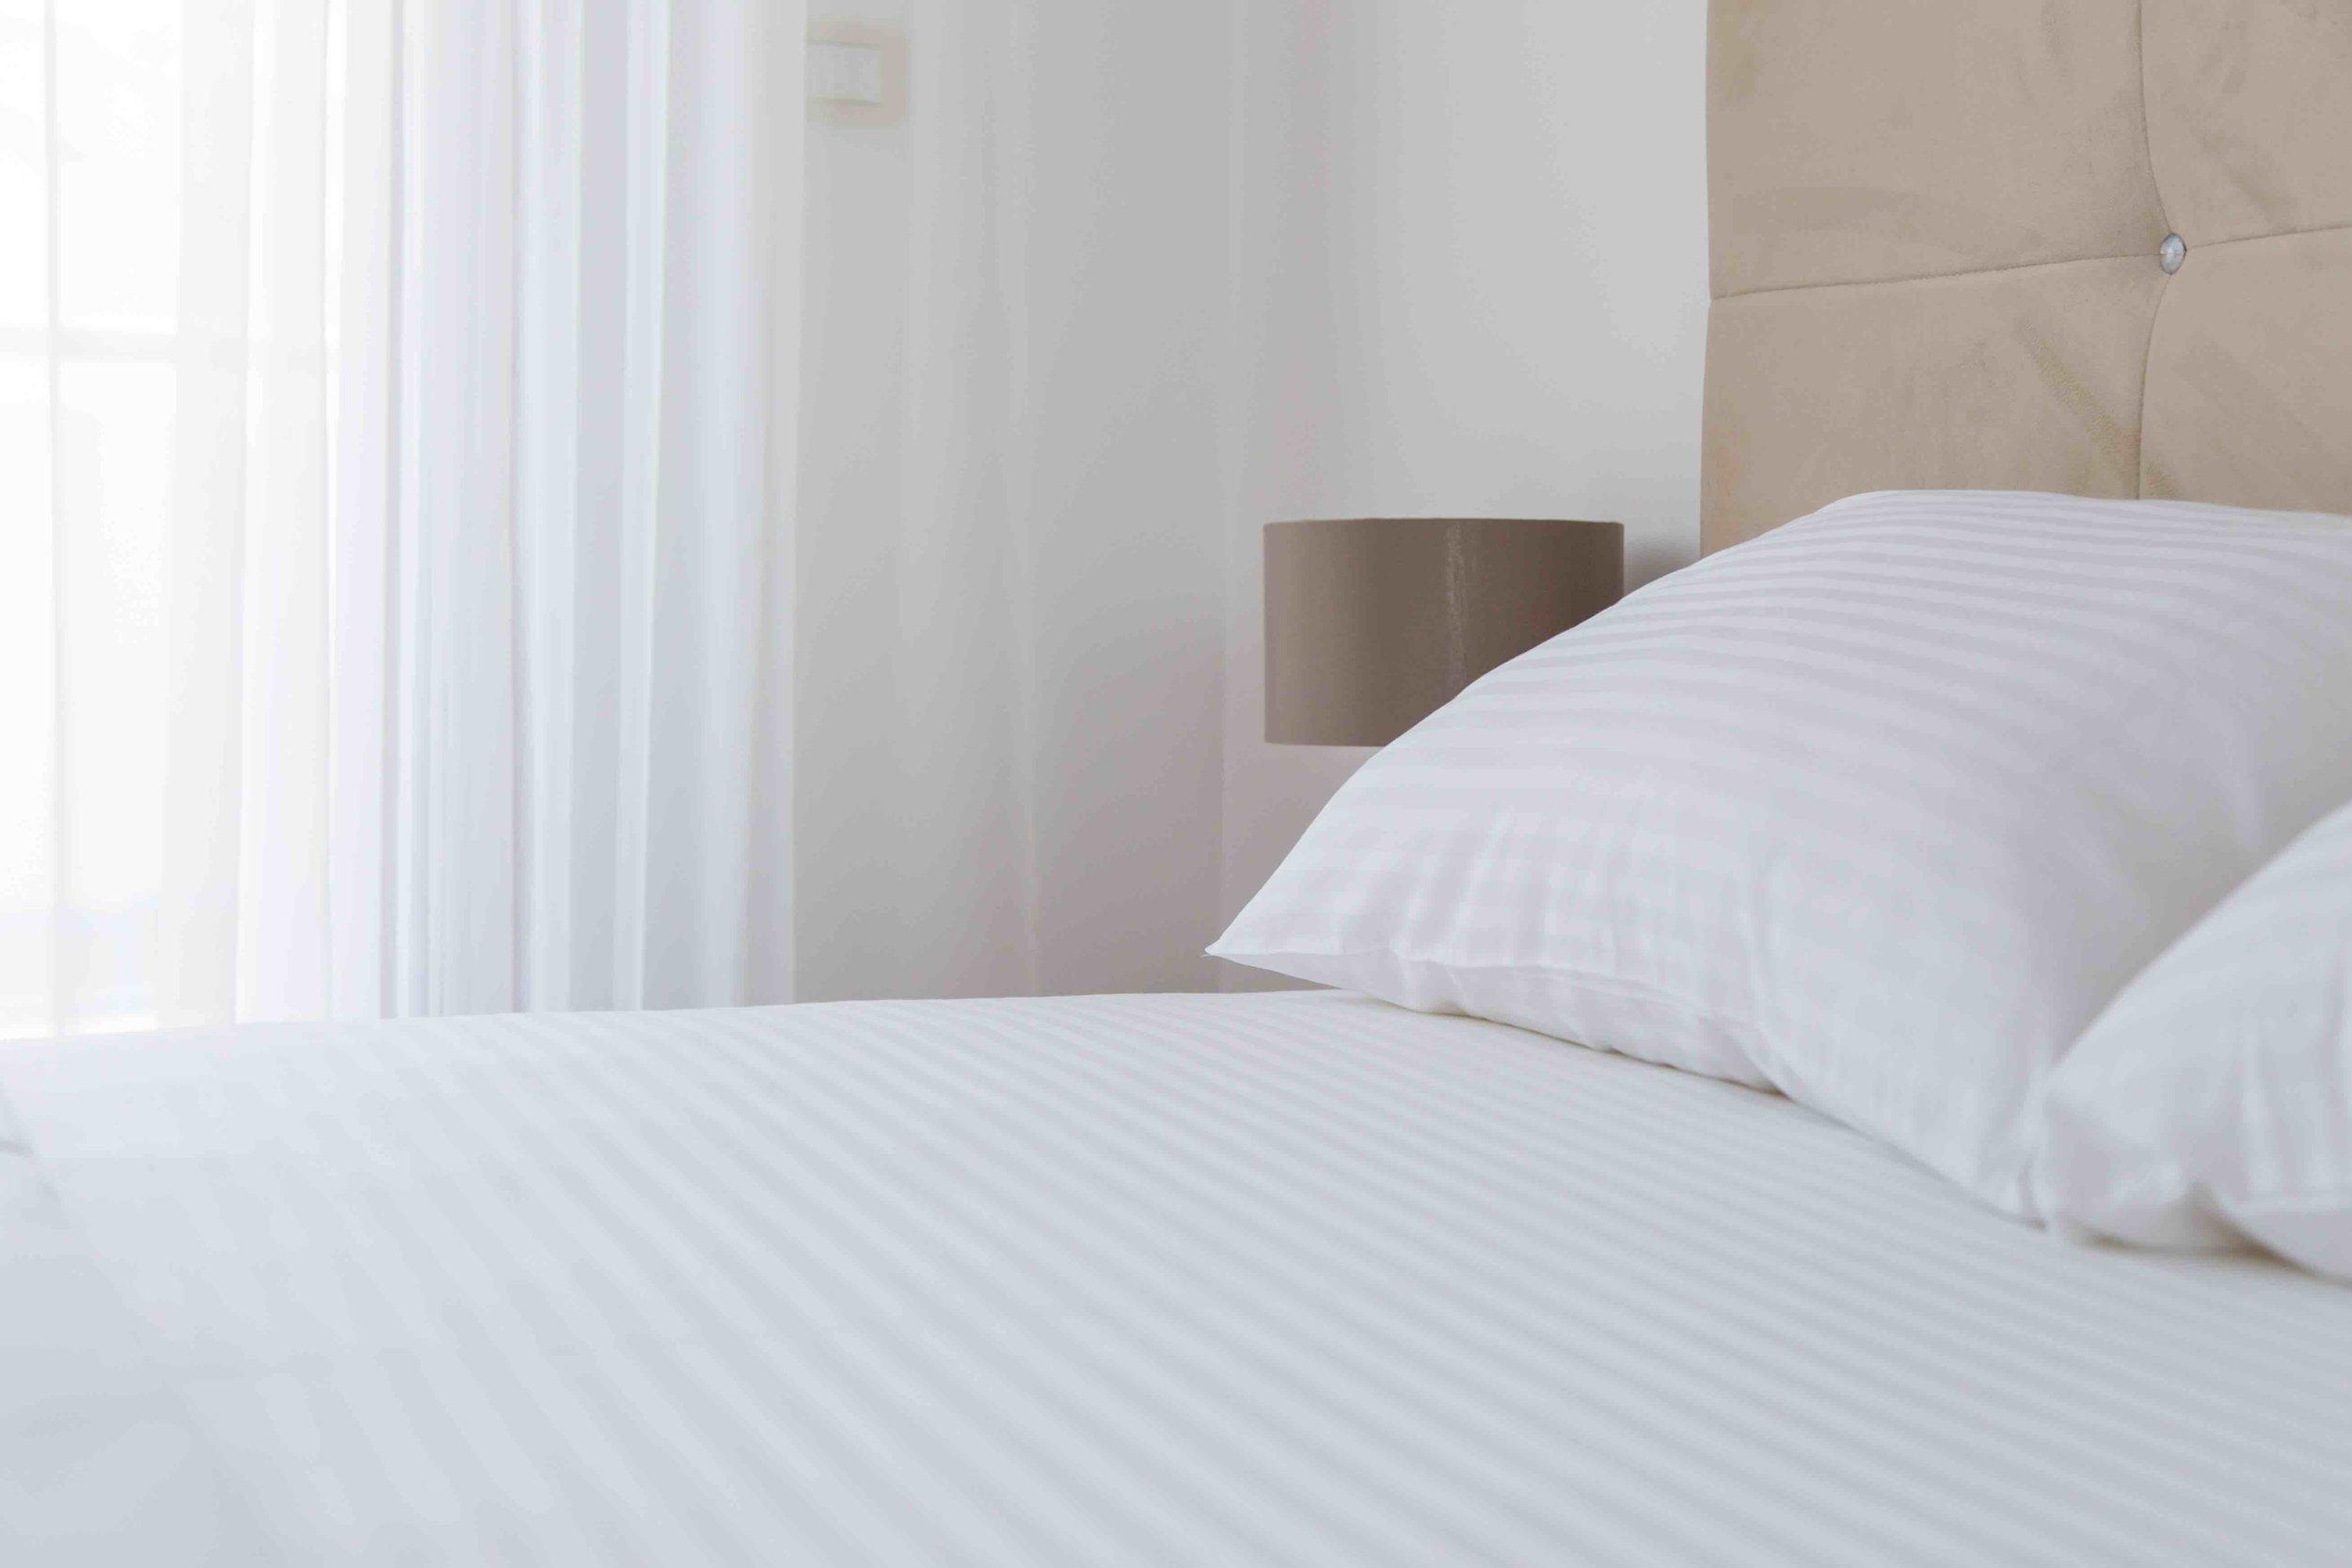 Aparthotel Апартотель | Anatolia |Becici Бечичи | Budva Будва | Montenegro Черногория | Apartments Апартаменты | Rents Аренда 11.jpg